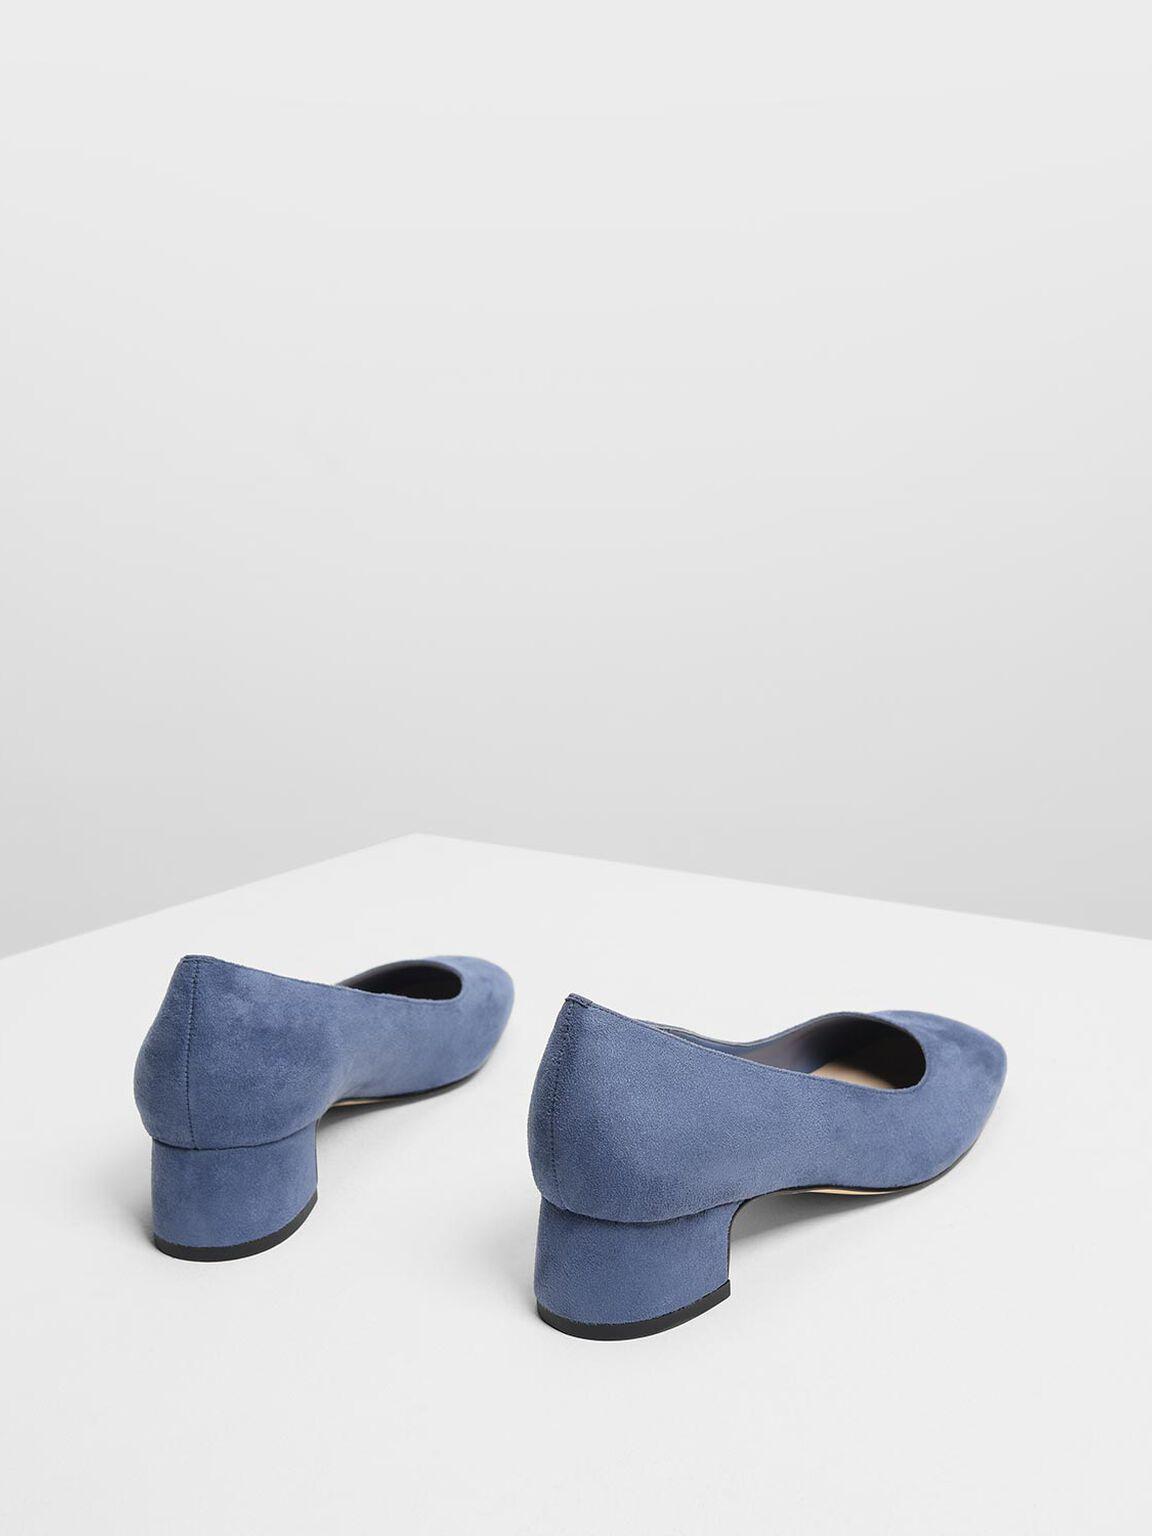 Covered Block Heel Pumps, Dark Blue, hi-res